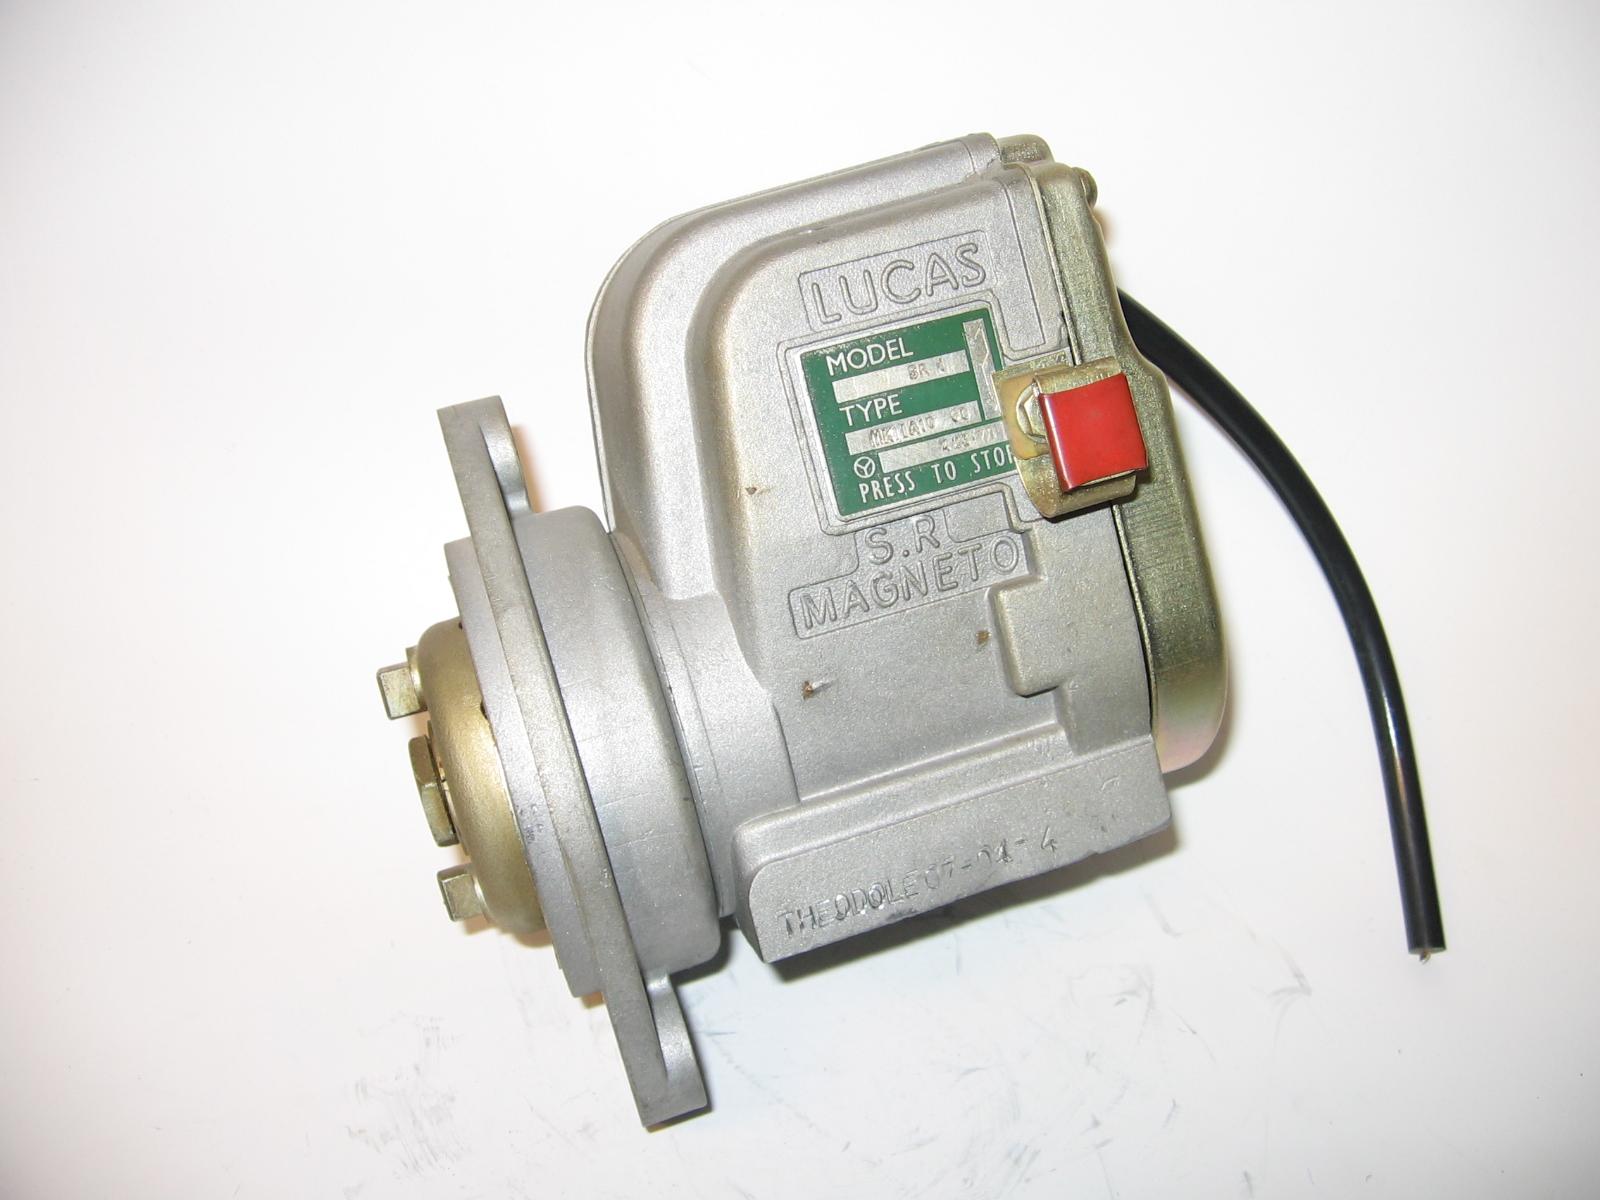 Lucas SR1 MK1A